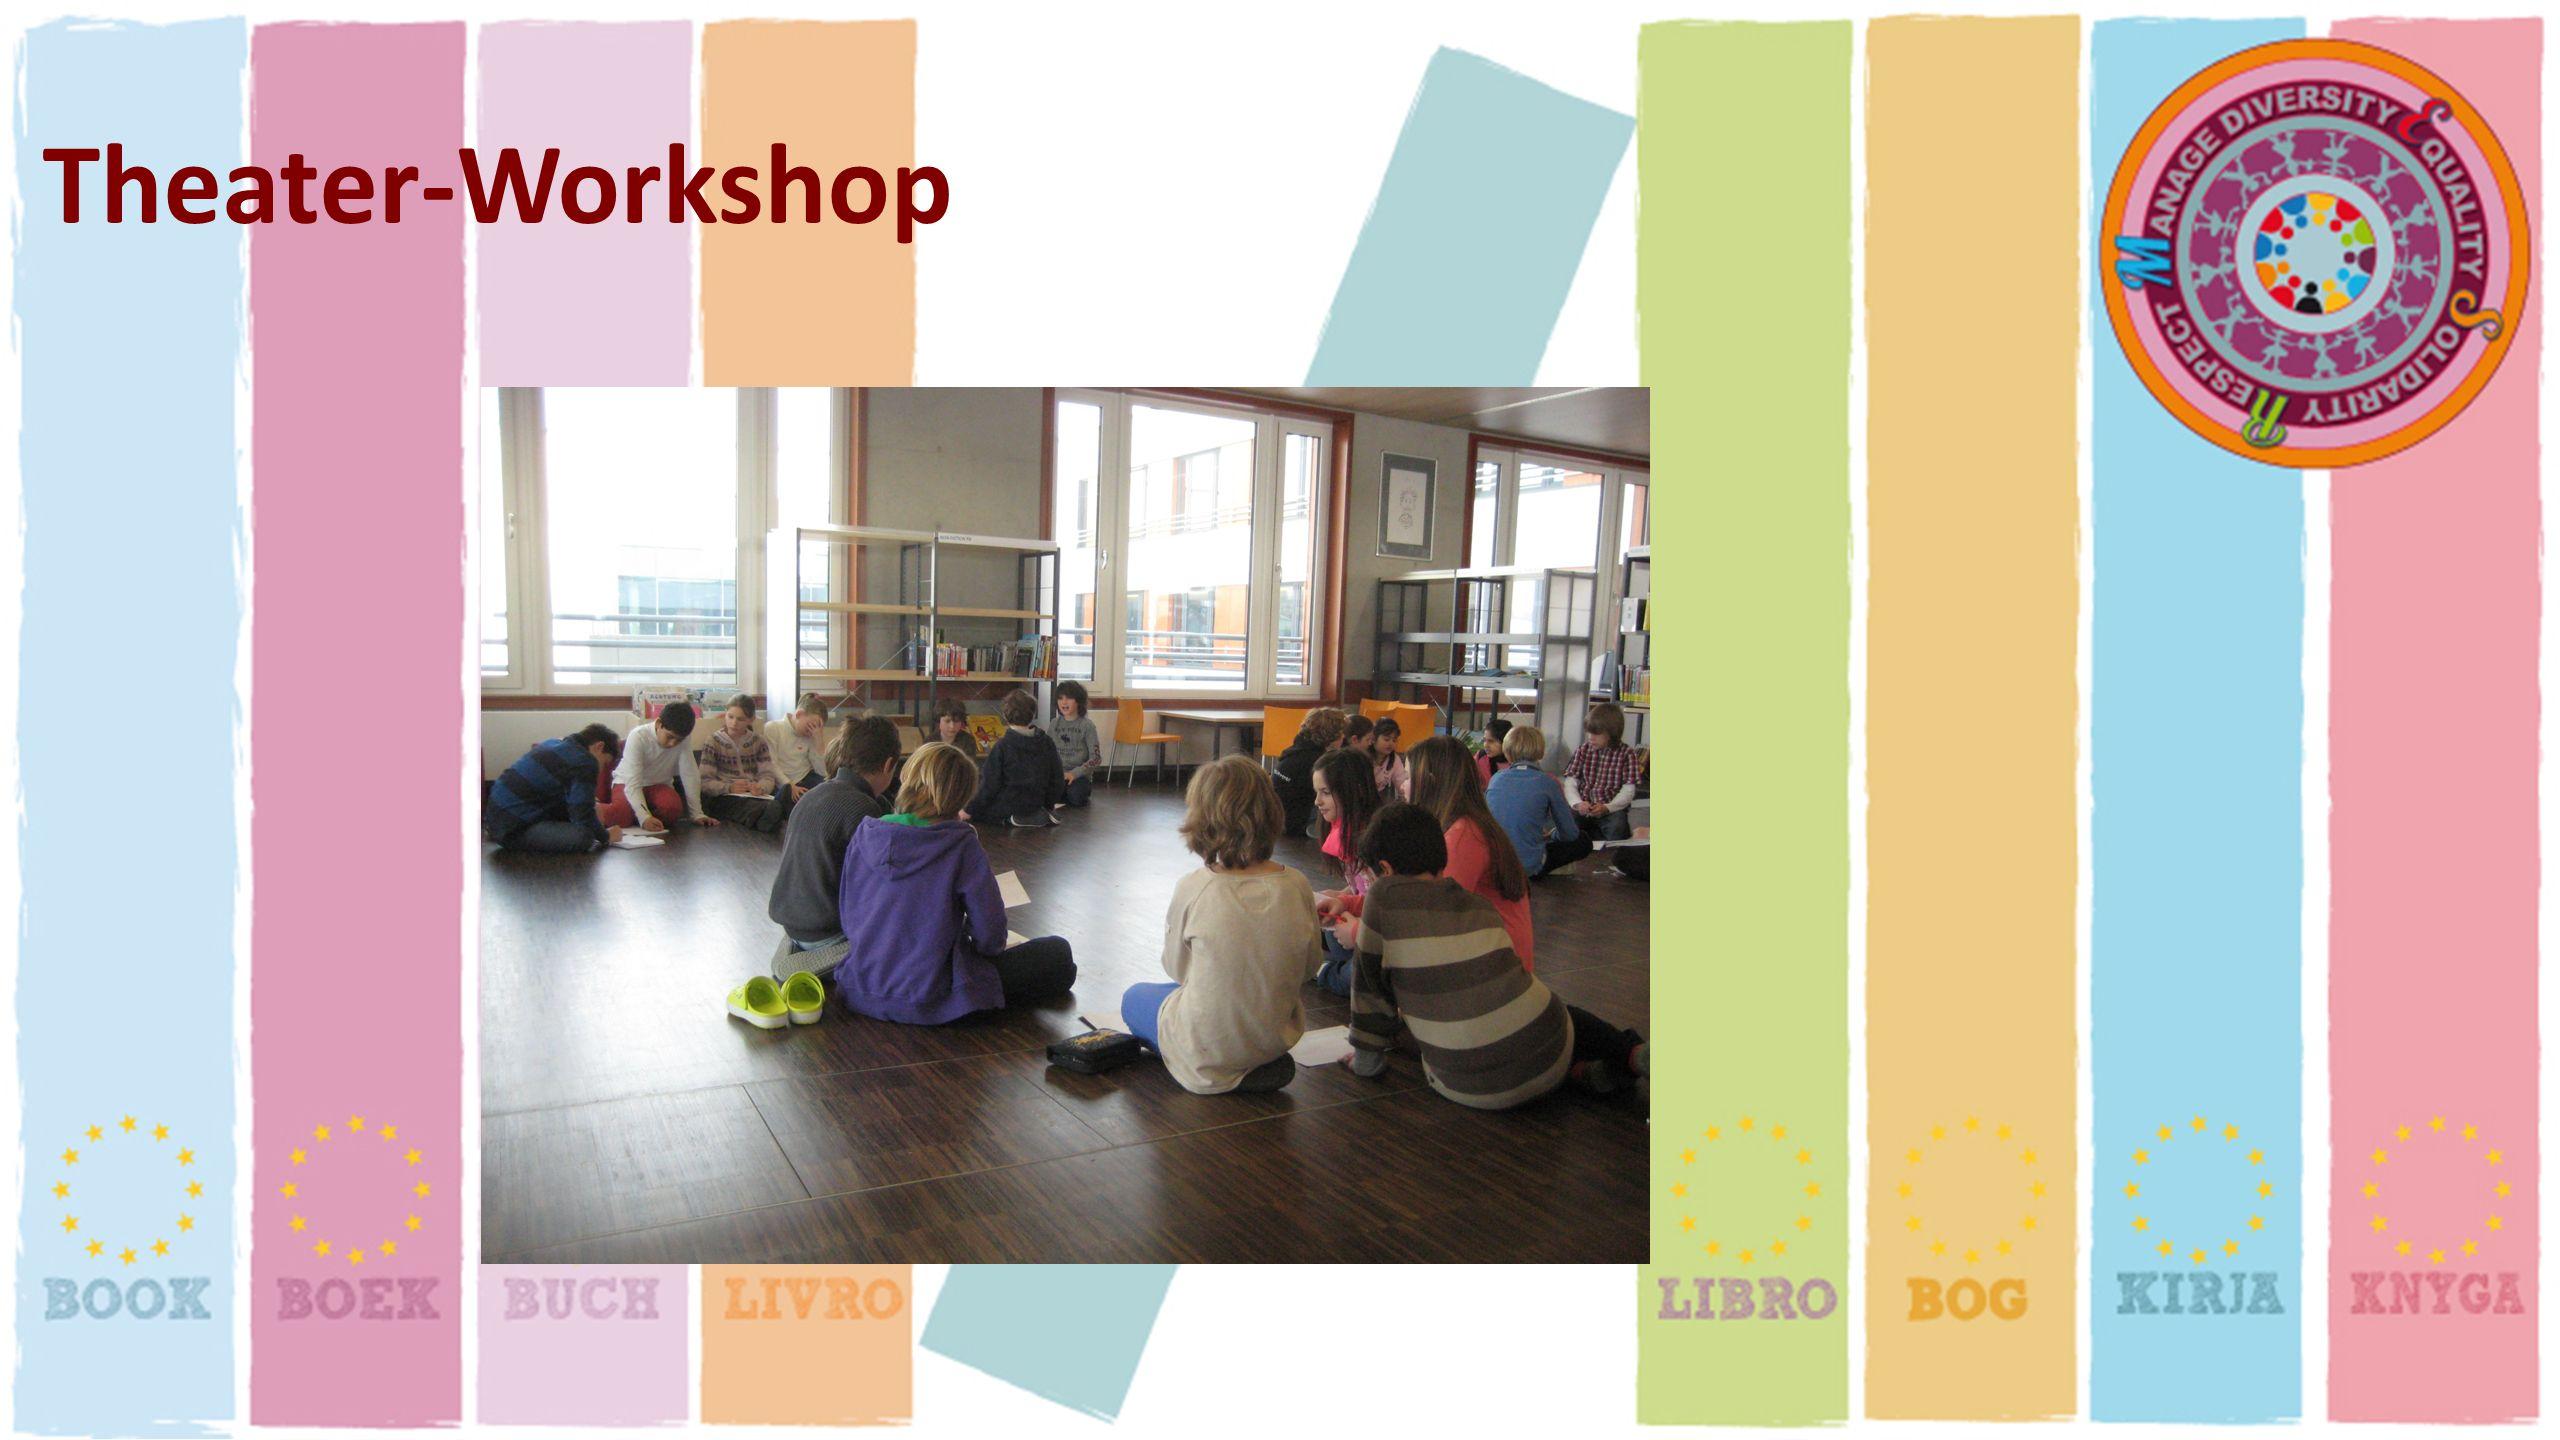 Theater-Workshop